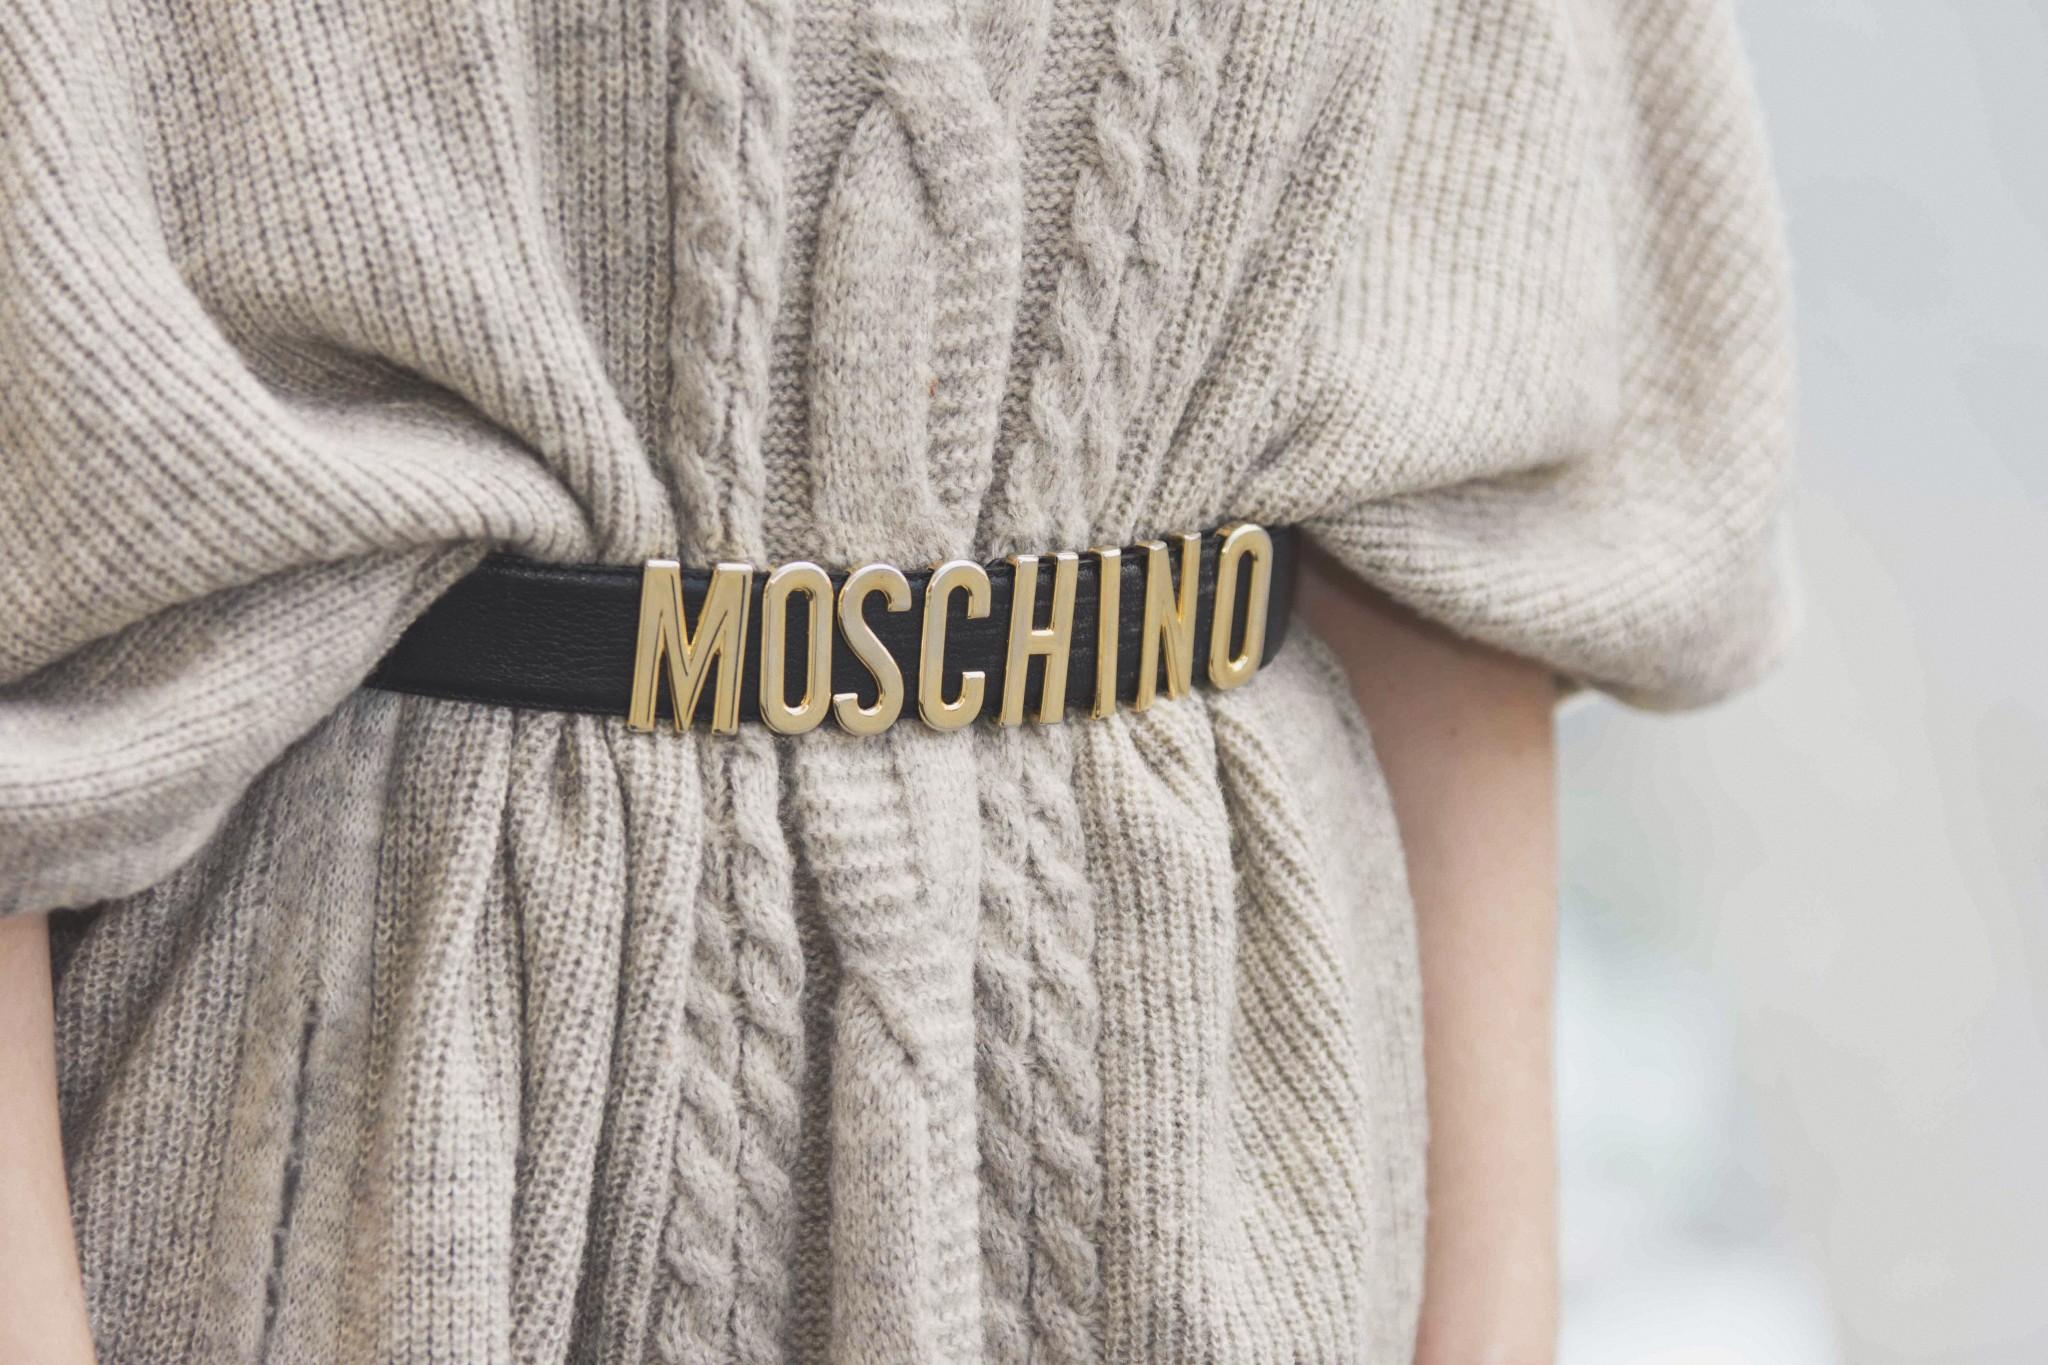 Poncho, Zopfmuster, Moschino, Ledergürtel, Blogger, bloggen, Muenchen, Munich